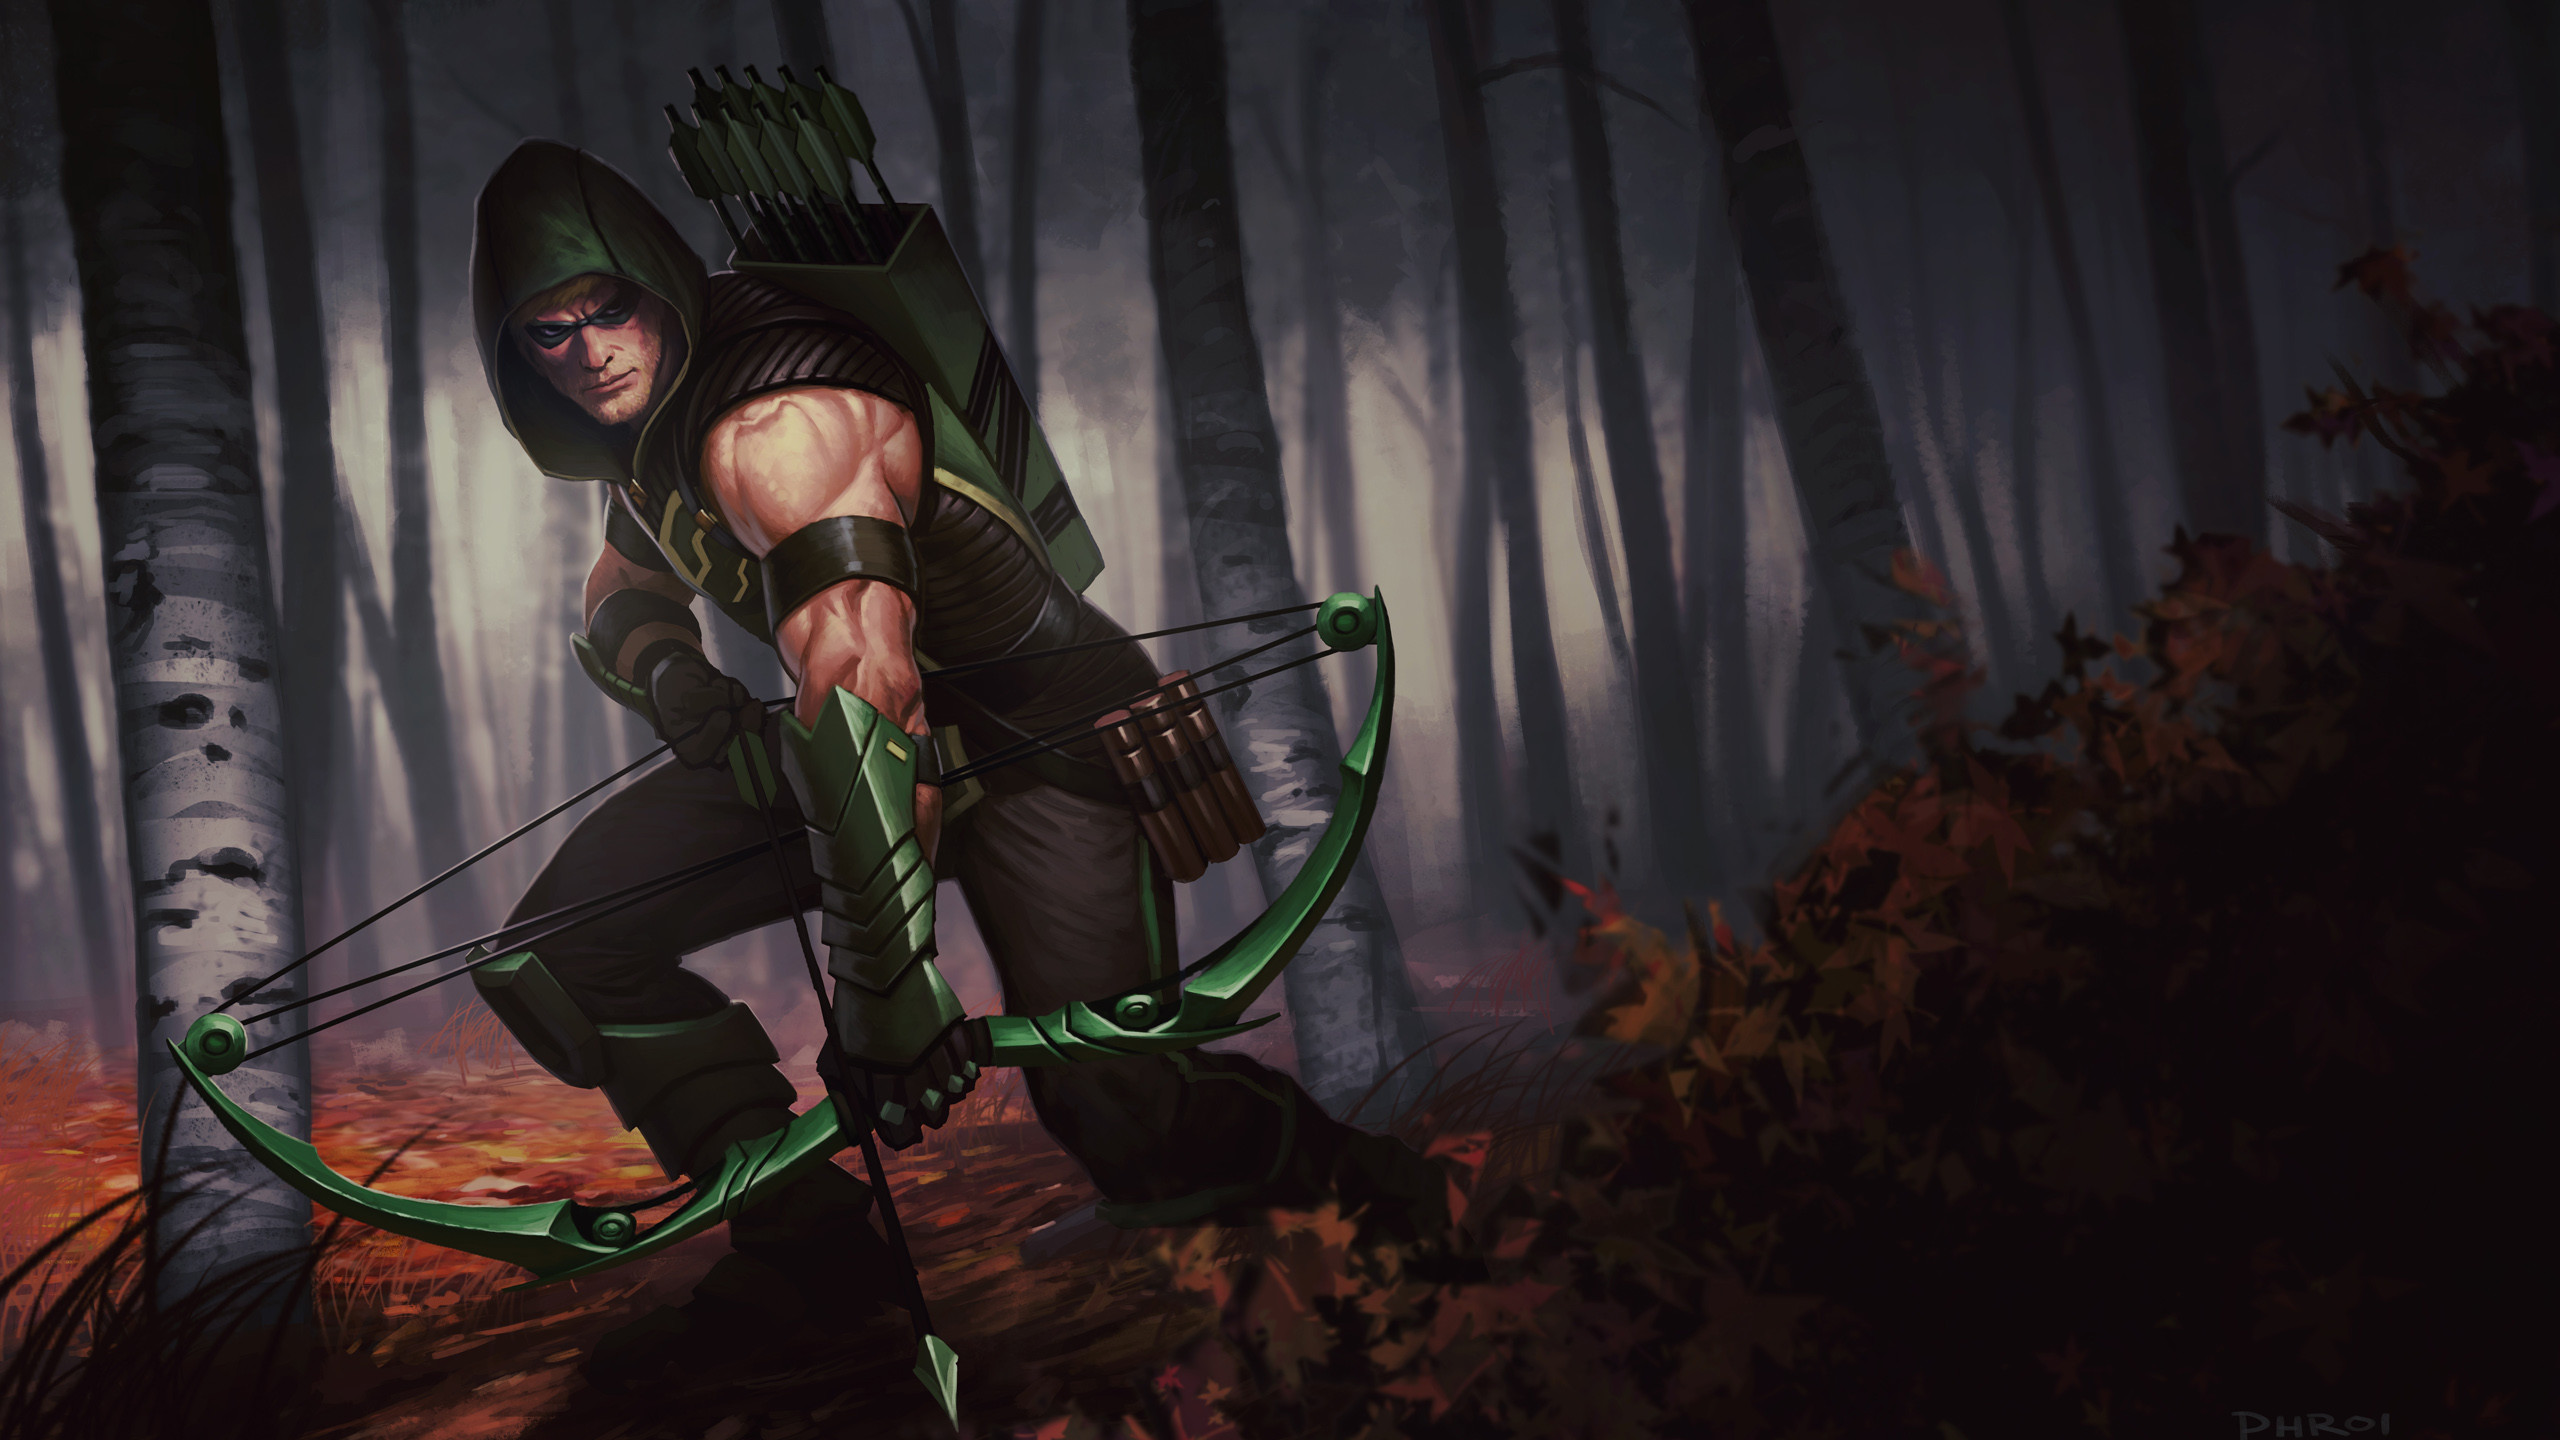 great HD artwork and wallpaper of Arrow Tv series Design 2560×1440 Arrow  Wallpapers (